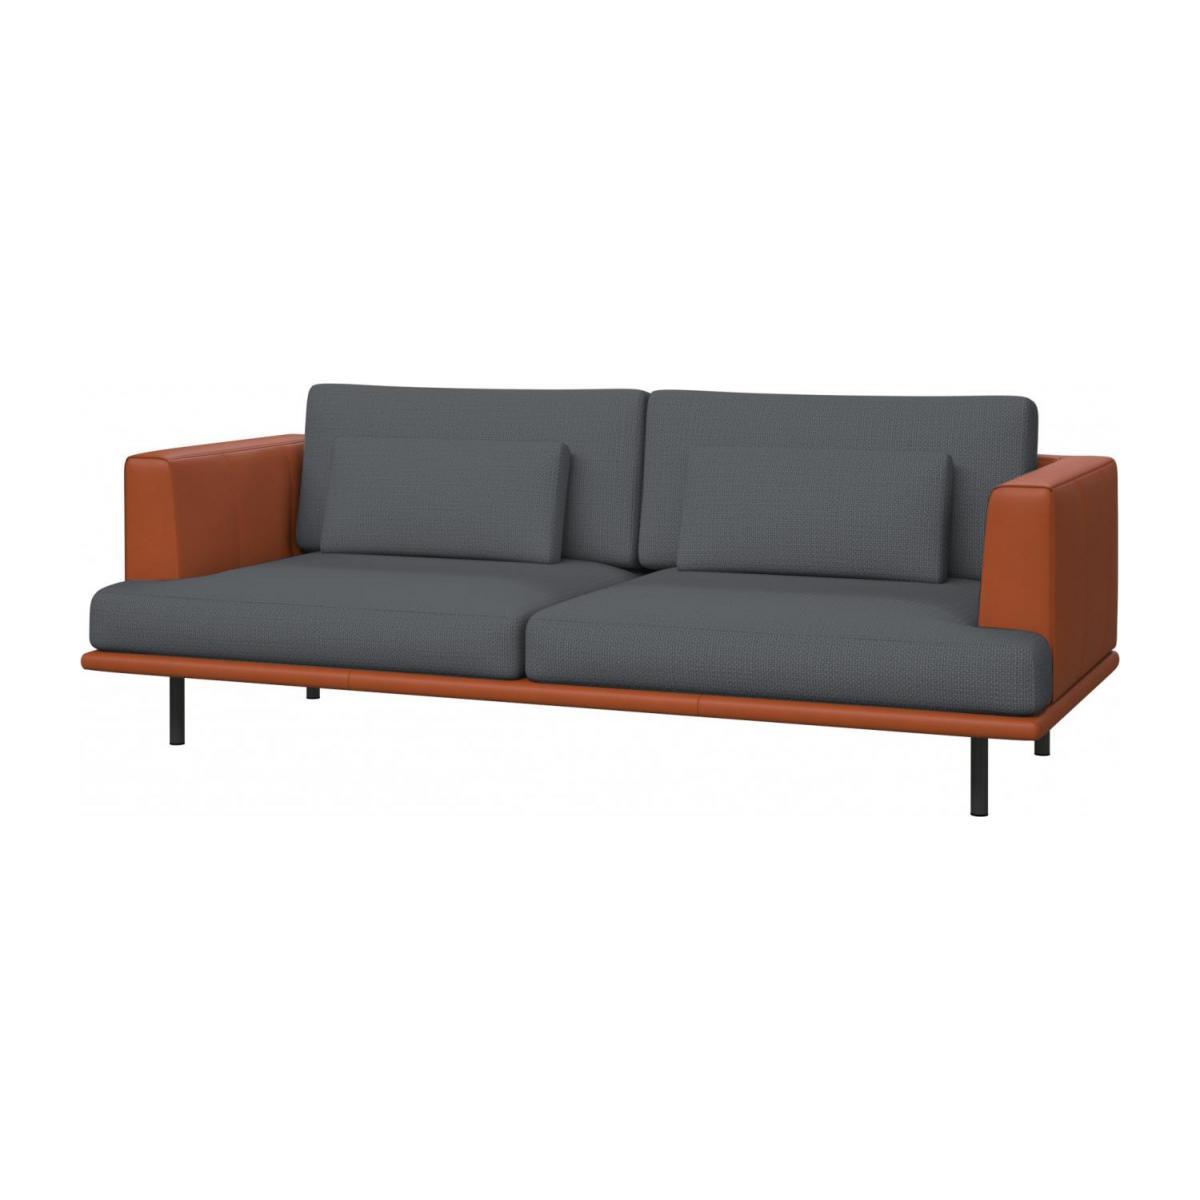 Reposabrazos sofa S5d8 Baci sofà 3 Plazas Tela Gris Base Y Reposabrazos Piel Habitat